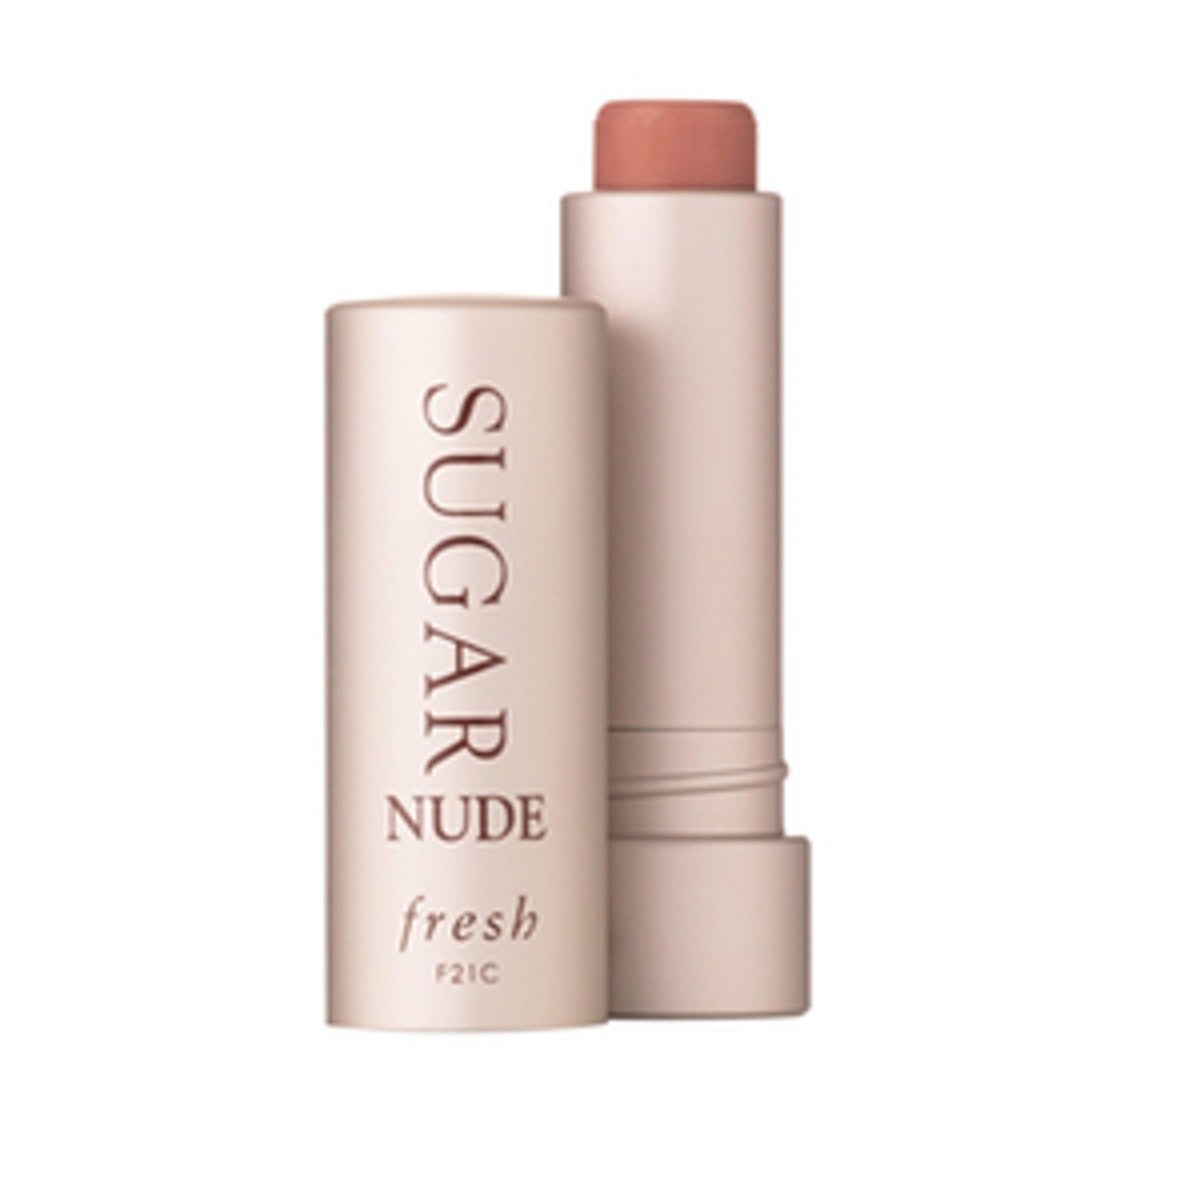 Sugar Tinted Lip Treatment In Sugar Nude